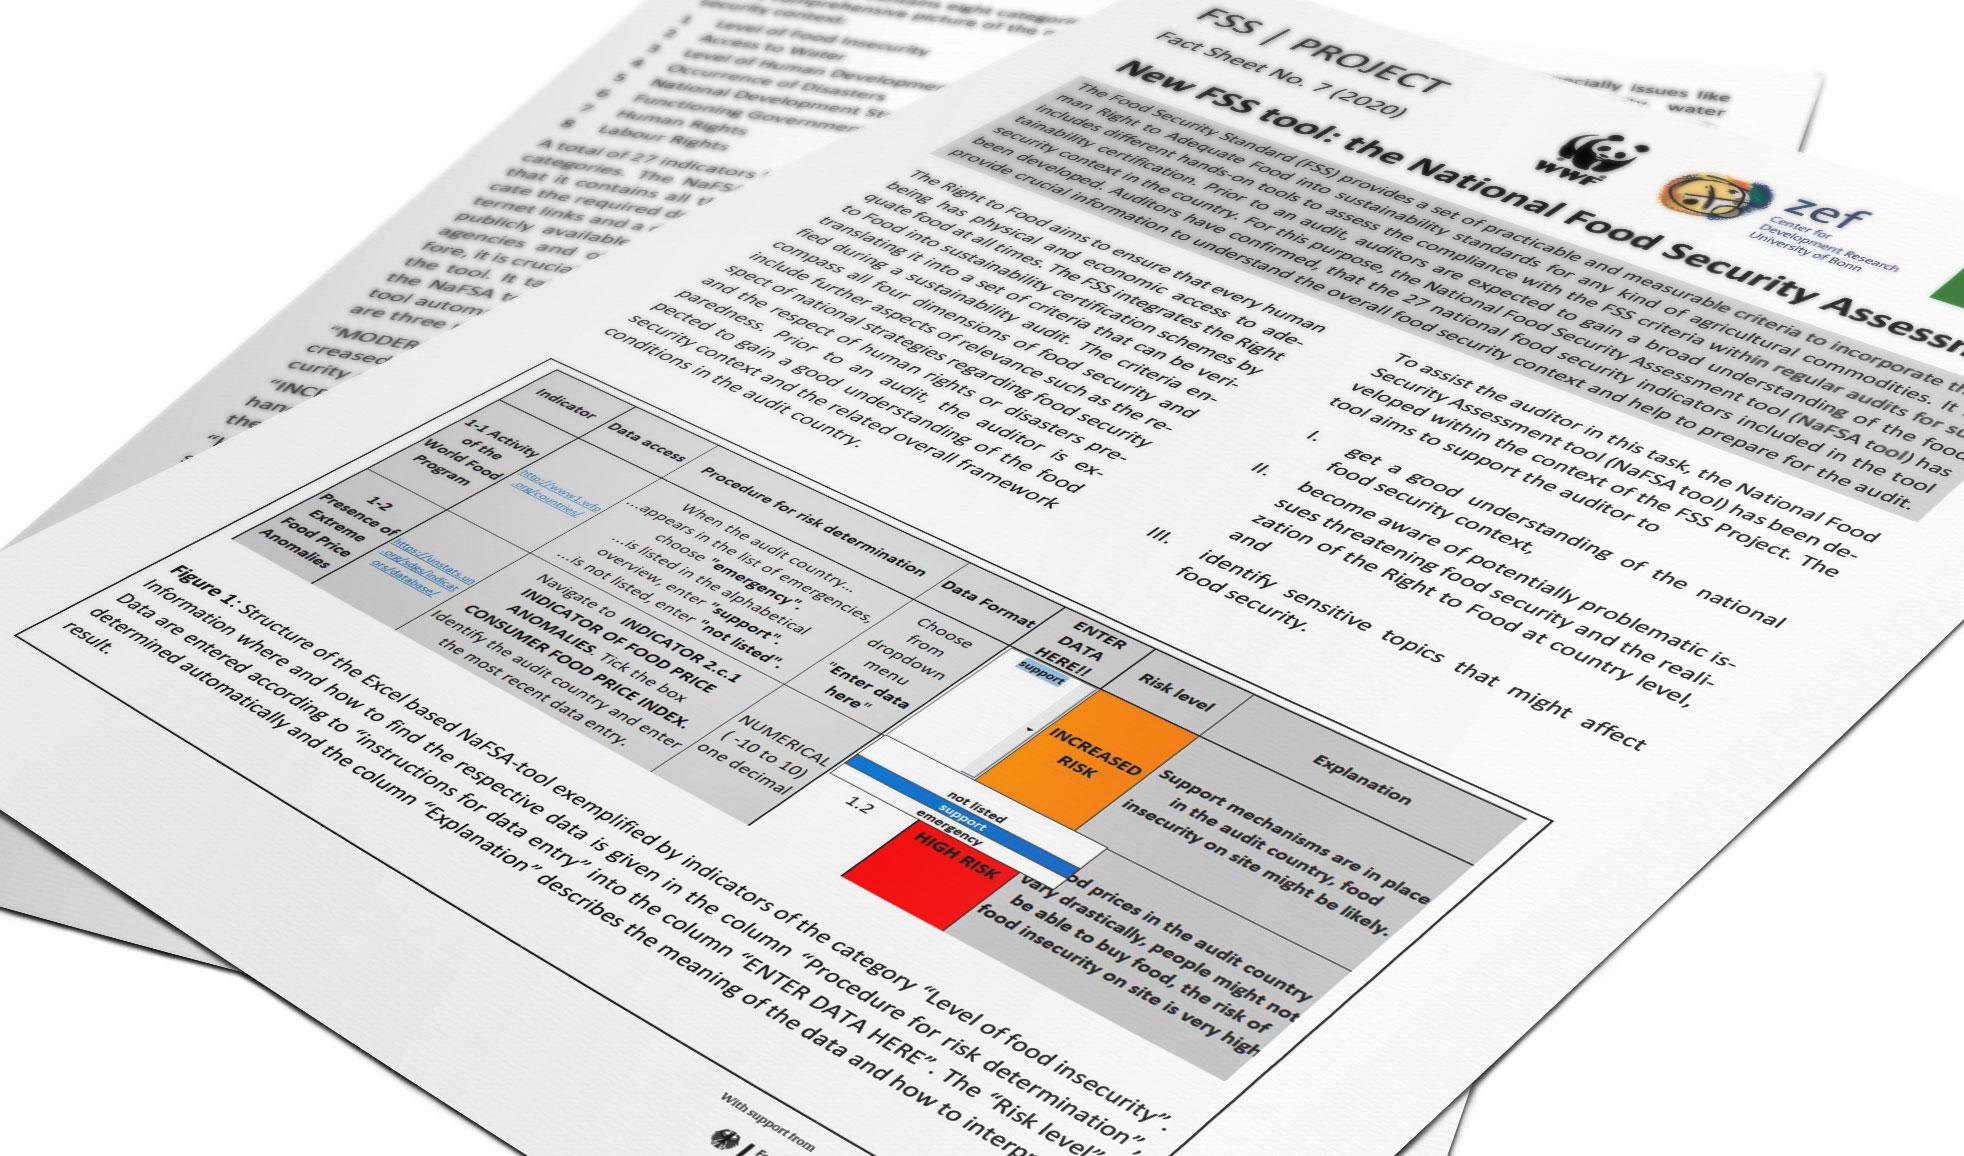 2020-fact-sheet-7-National-Food-Security-Assessment-Tool-teaser